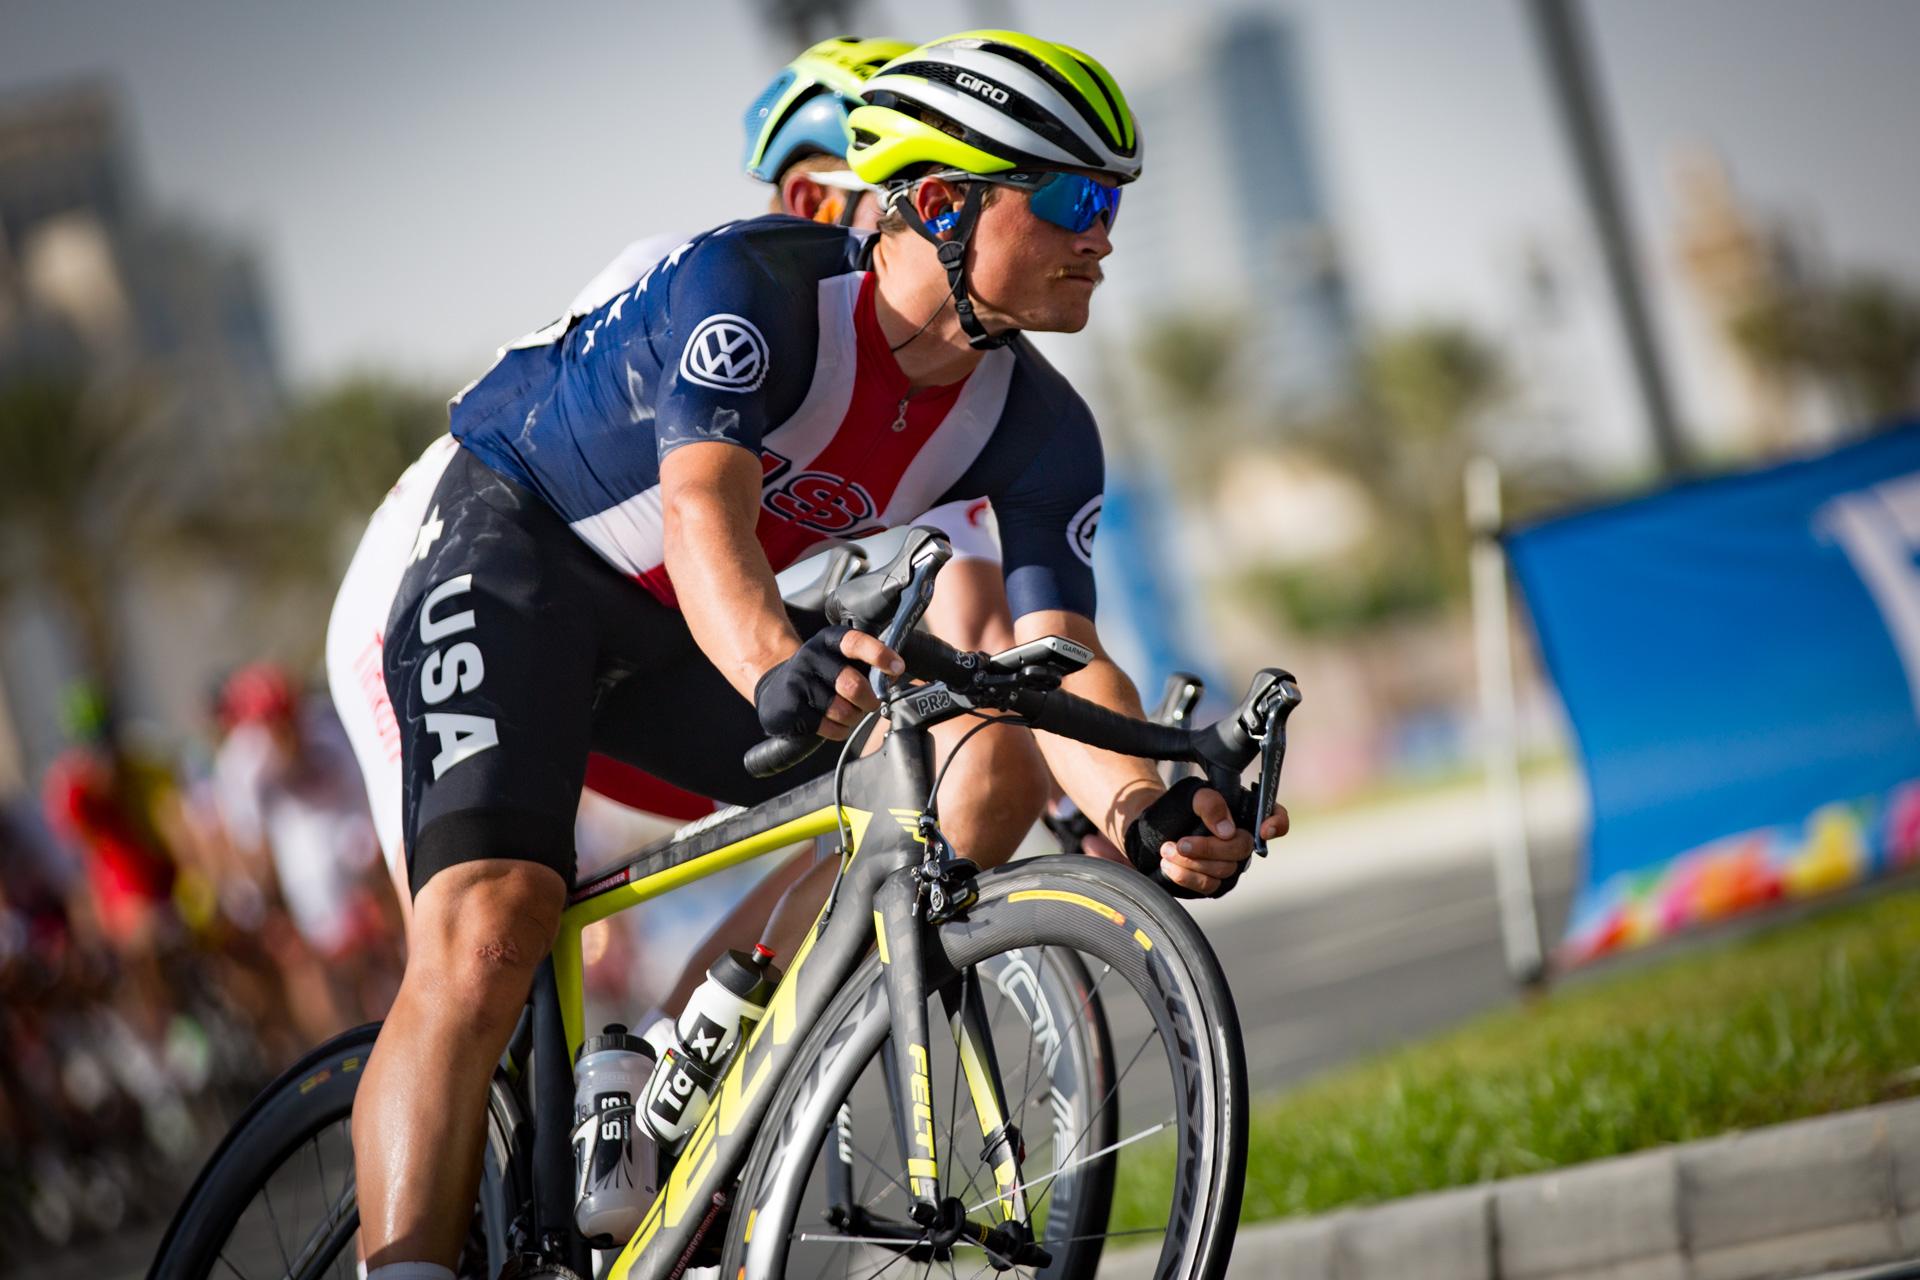 UCI Road World Championships Men's Road Race